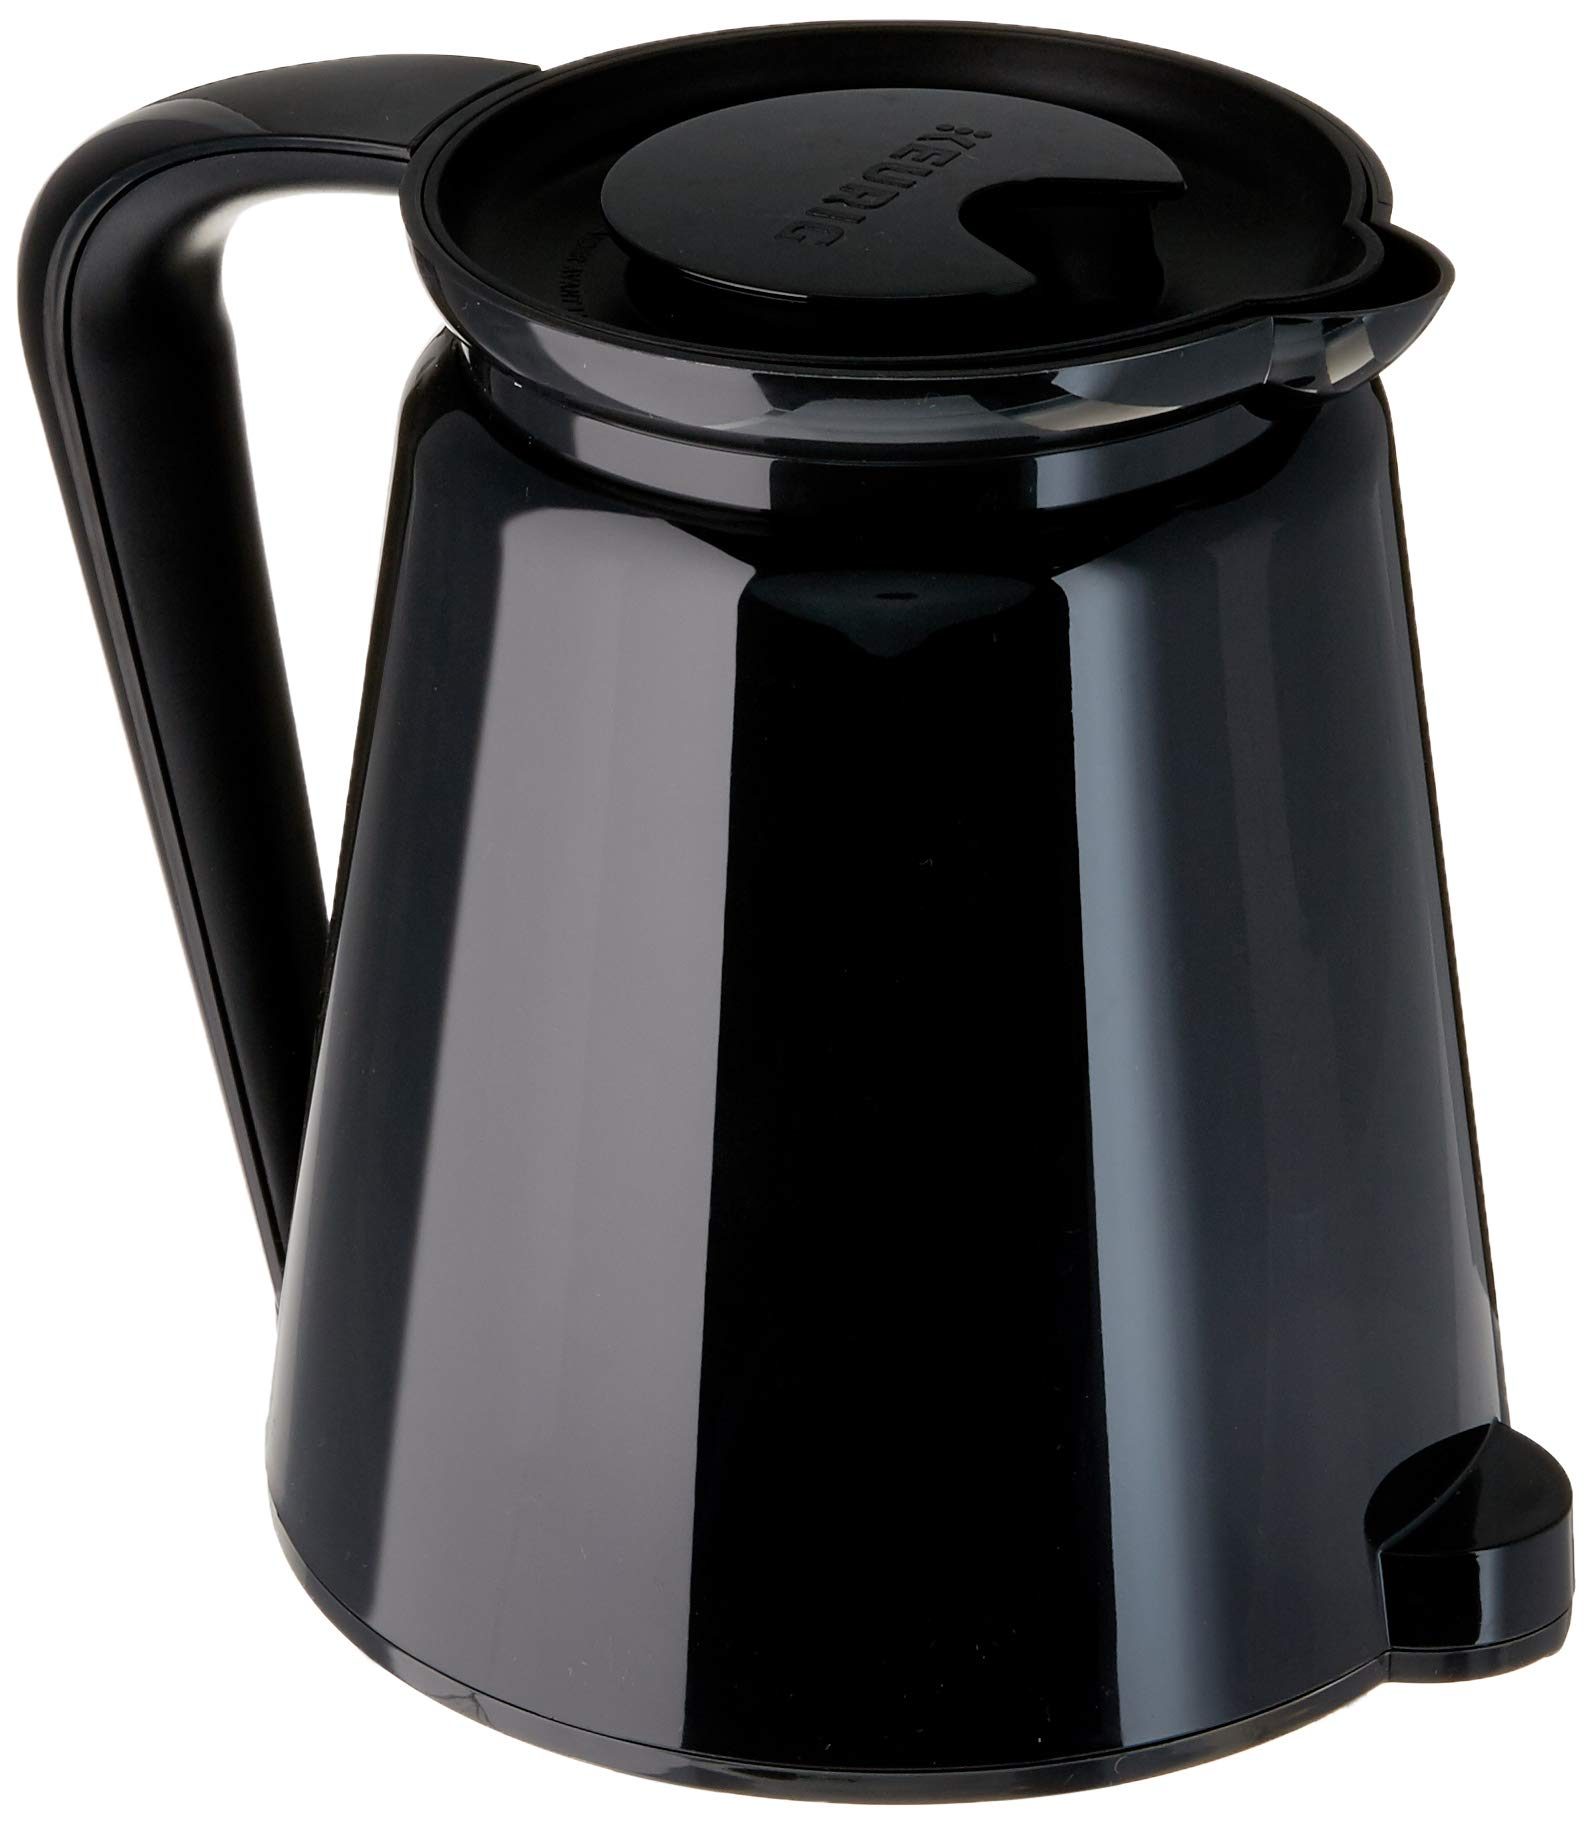 Keurig 2.0 Starter Carafe Brewing System, Black Finish